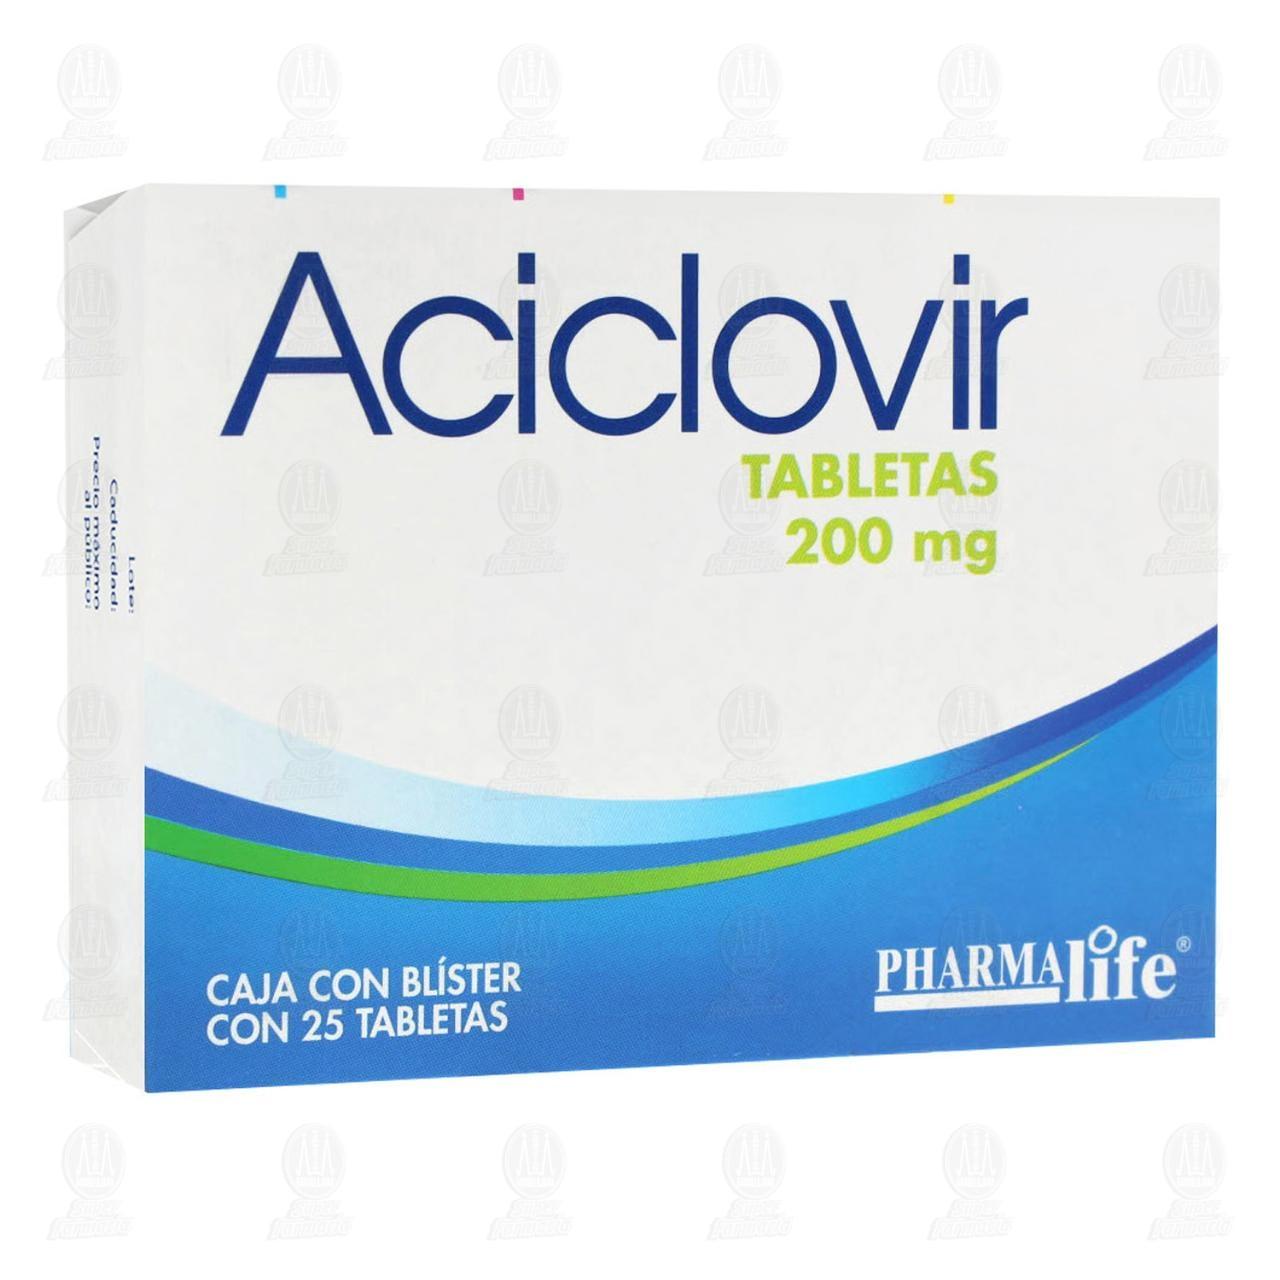 Comprar Aciclovir 200mg 25 Tabletas Pharmalife en Farmacias Guadalajara